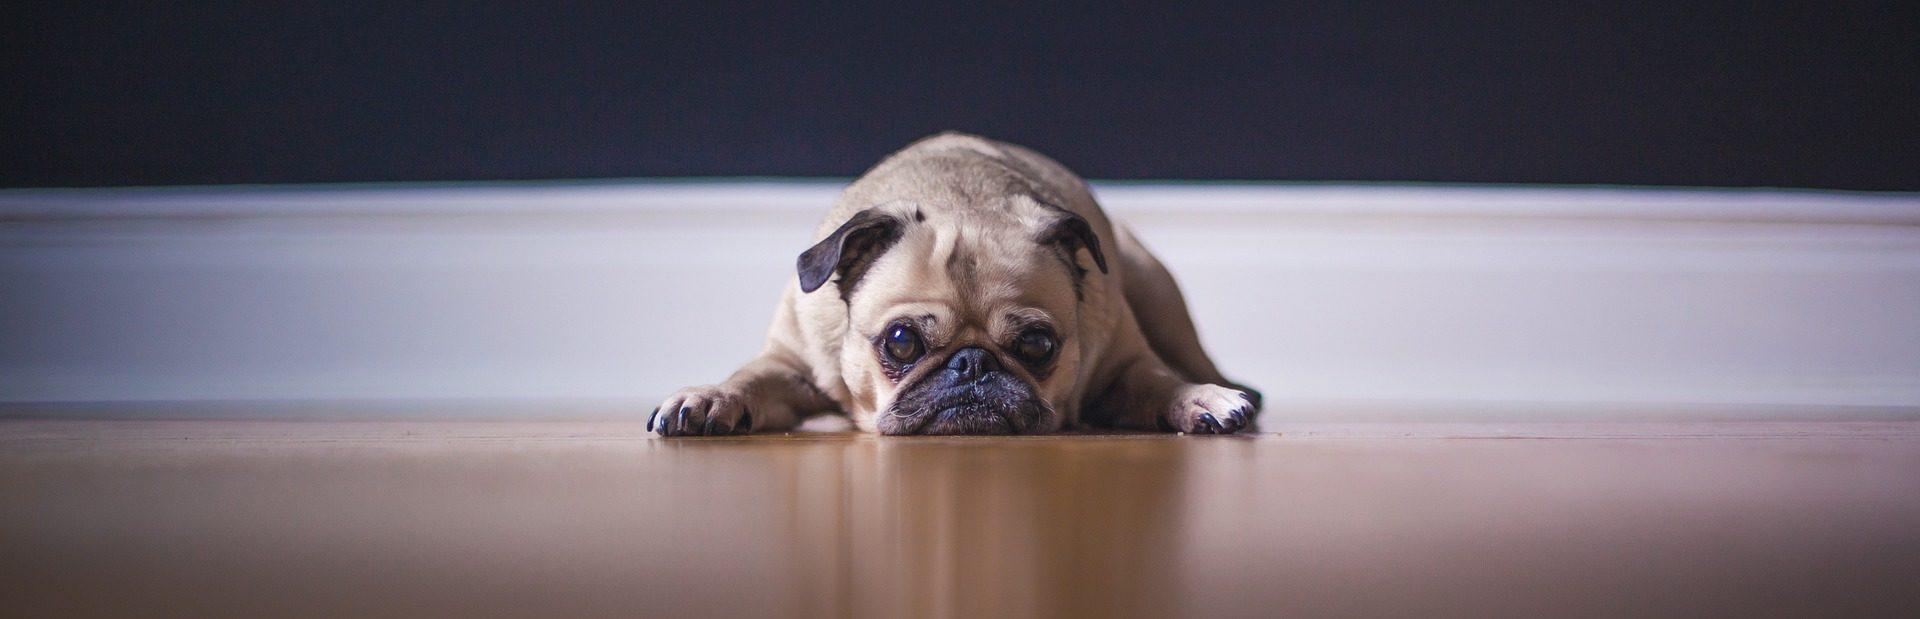 Hundebett Kunstleder Hintergrund II